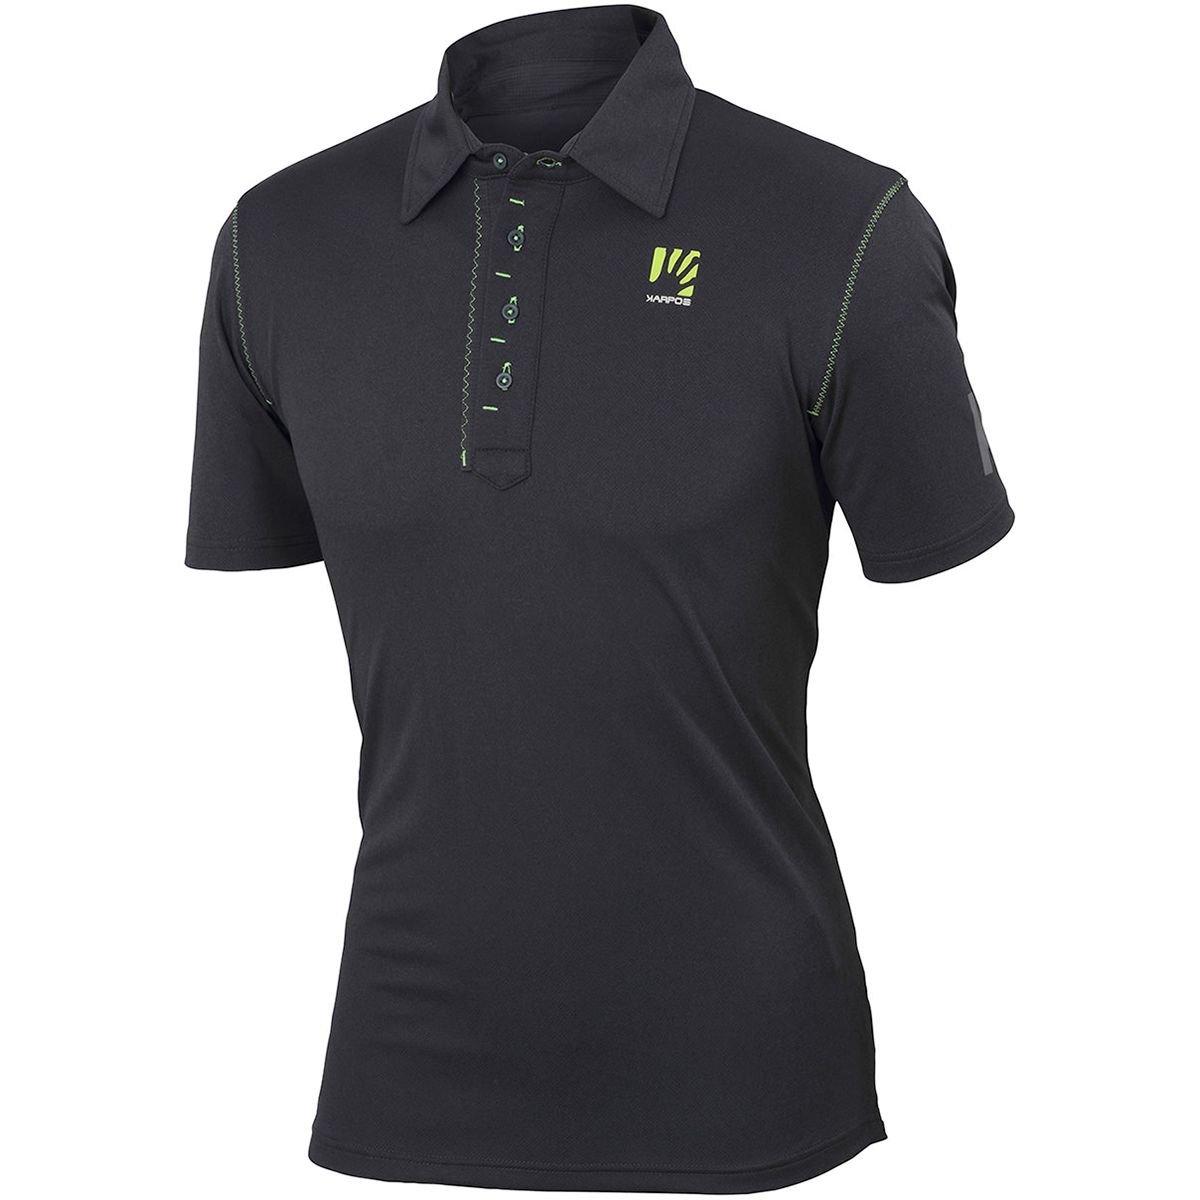 Karpos Sorapiss Polo Shirt - Dark Grau schwarz